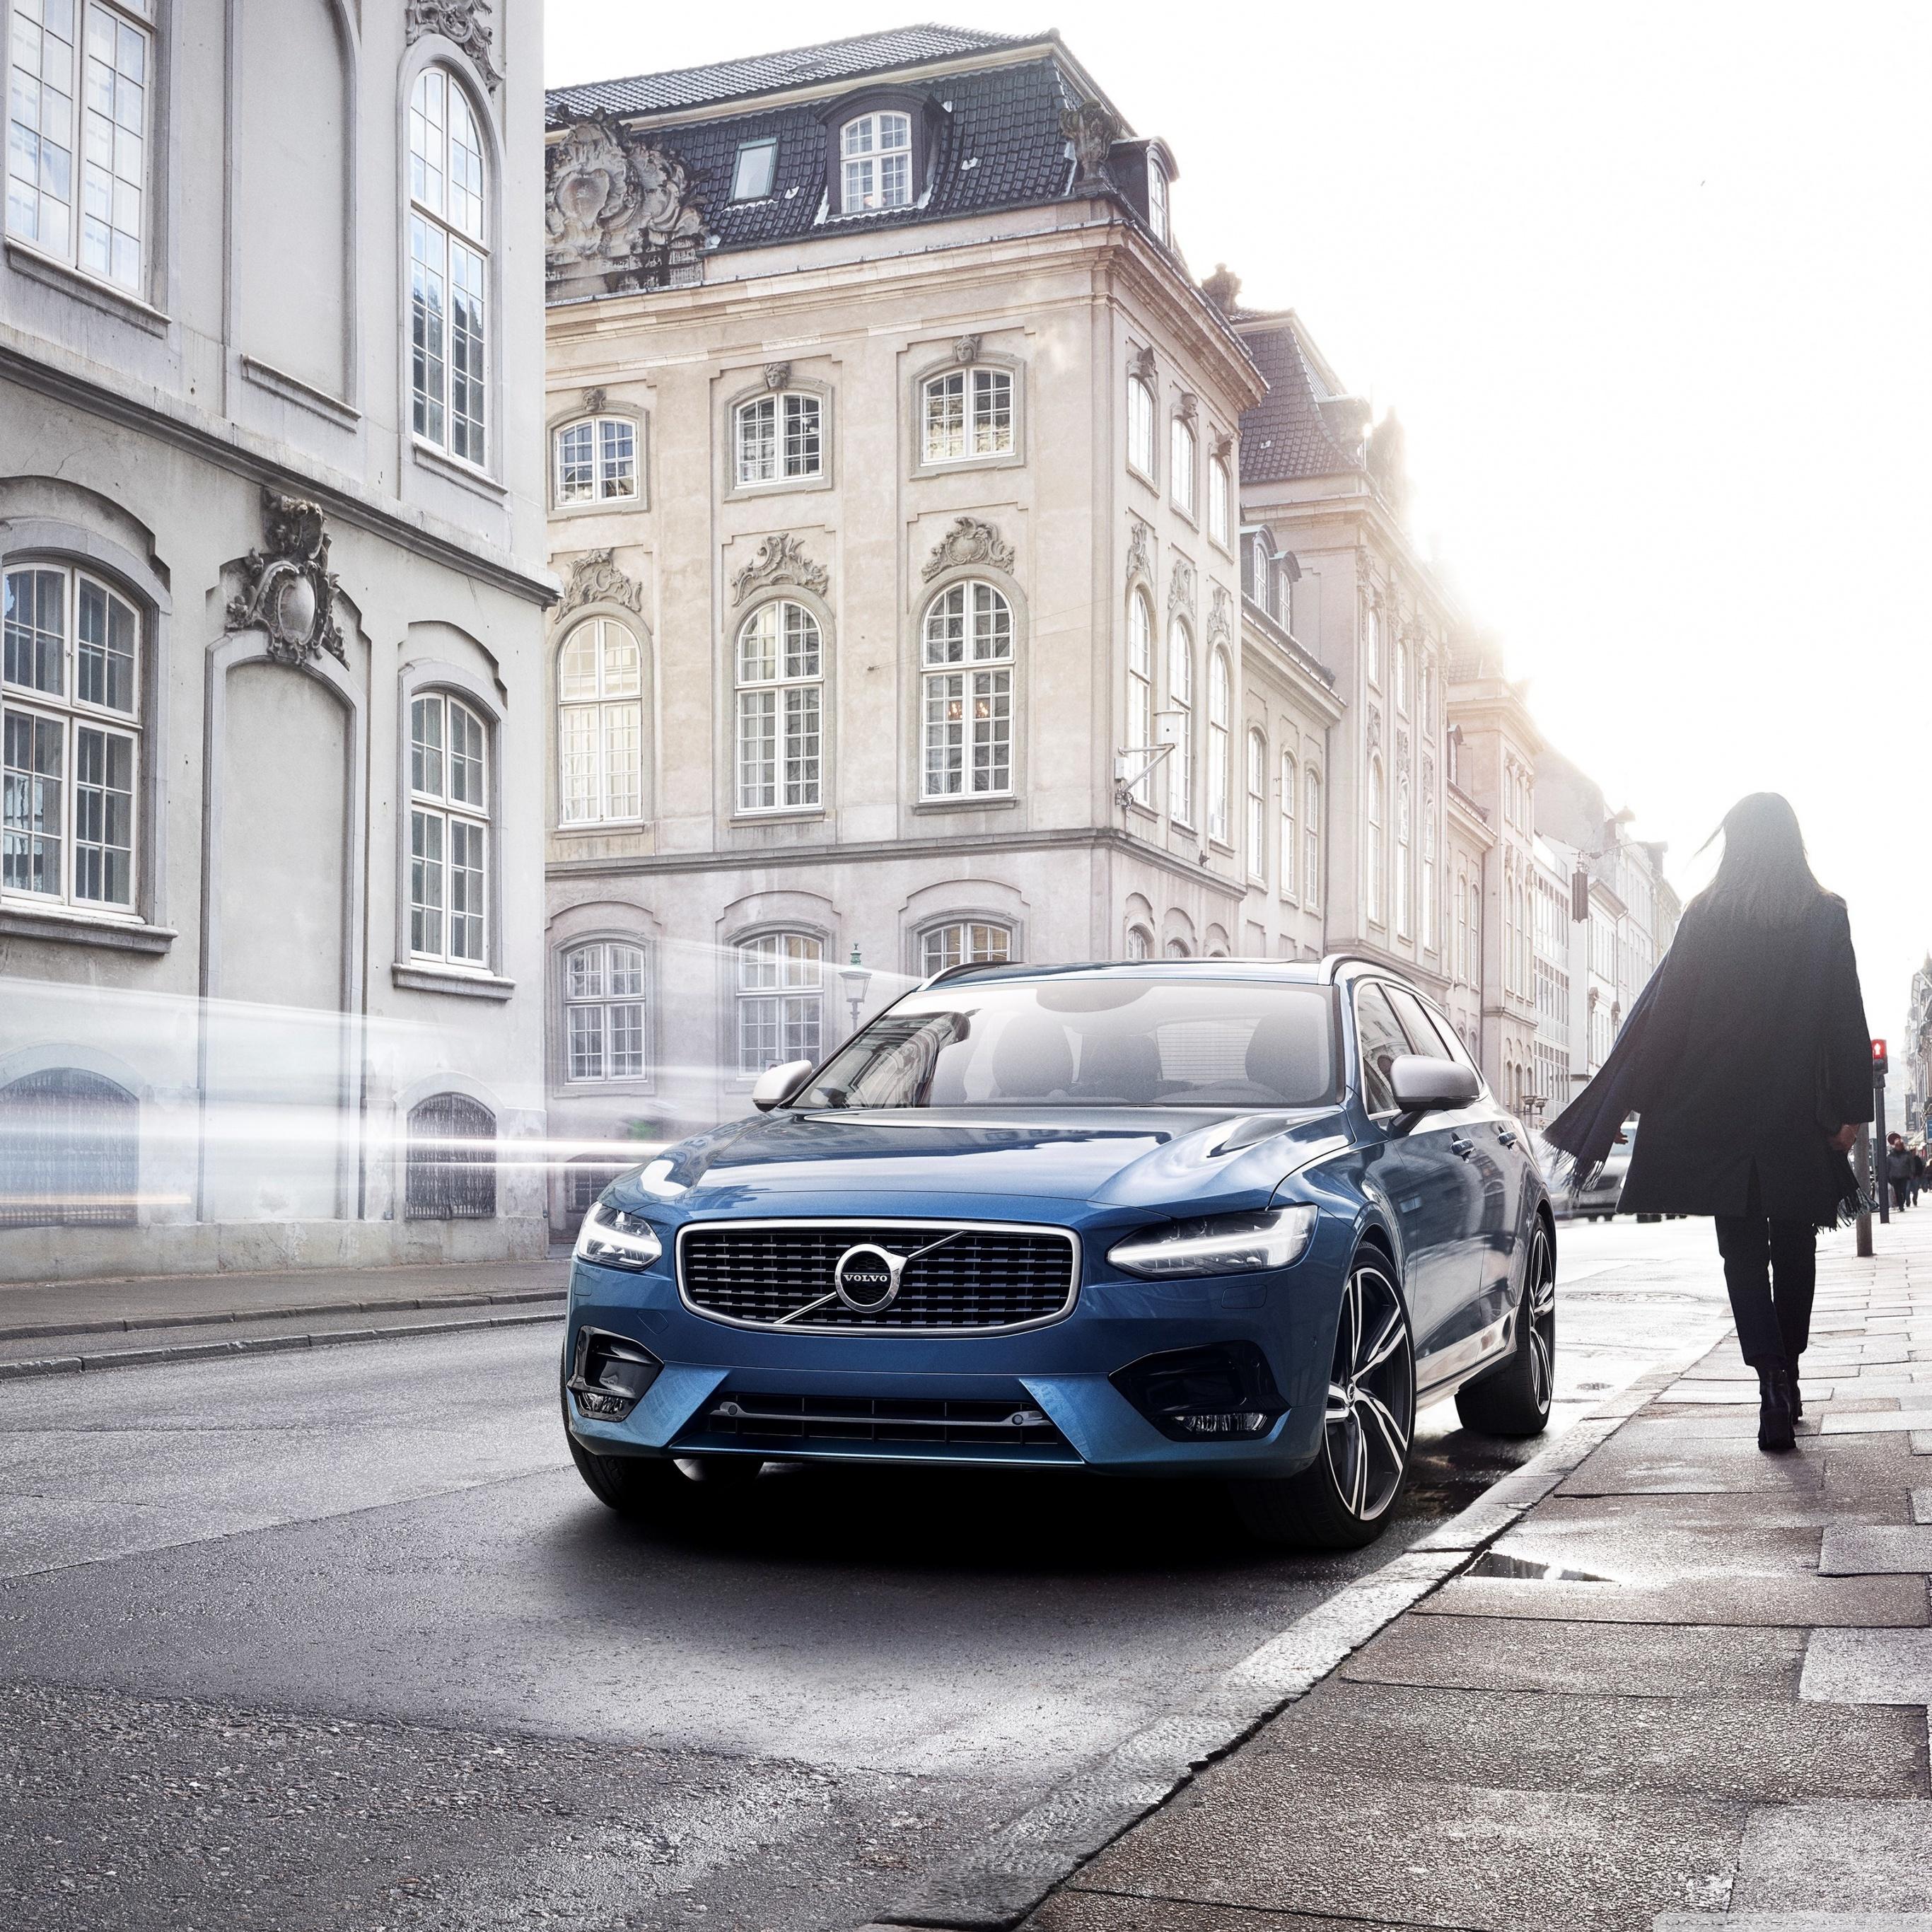 Volvo Car Wallpaper: Volvo S90 Blue Car 4K HD Desktop Wallpaper For 4K Ultra HD